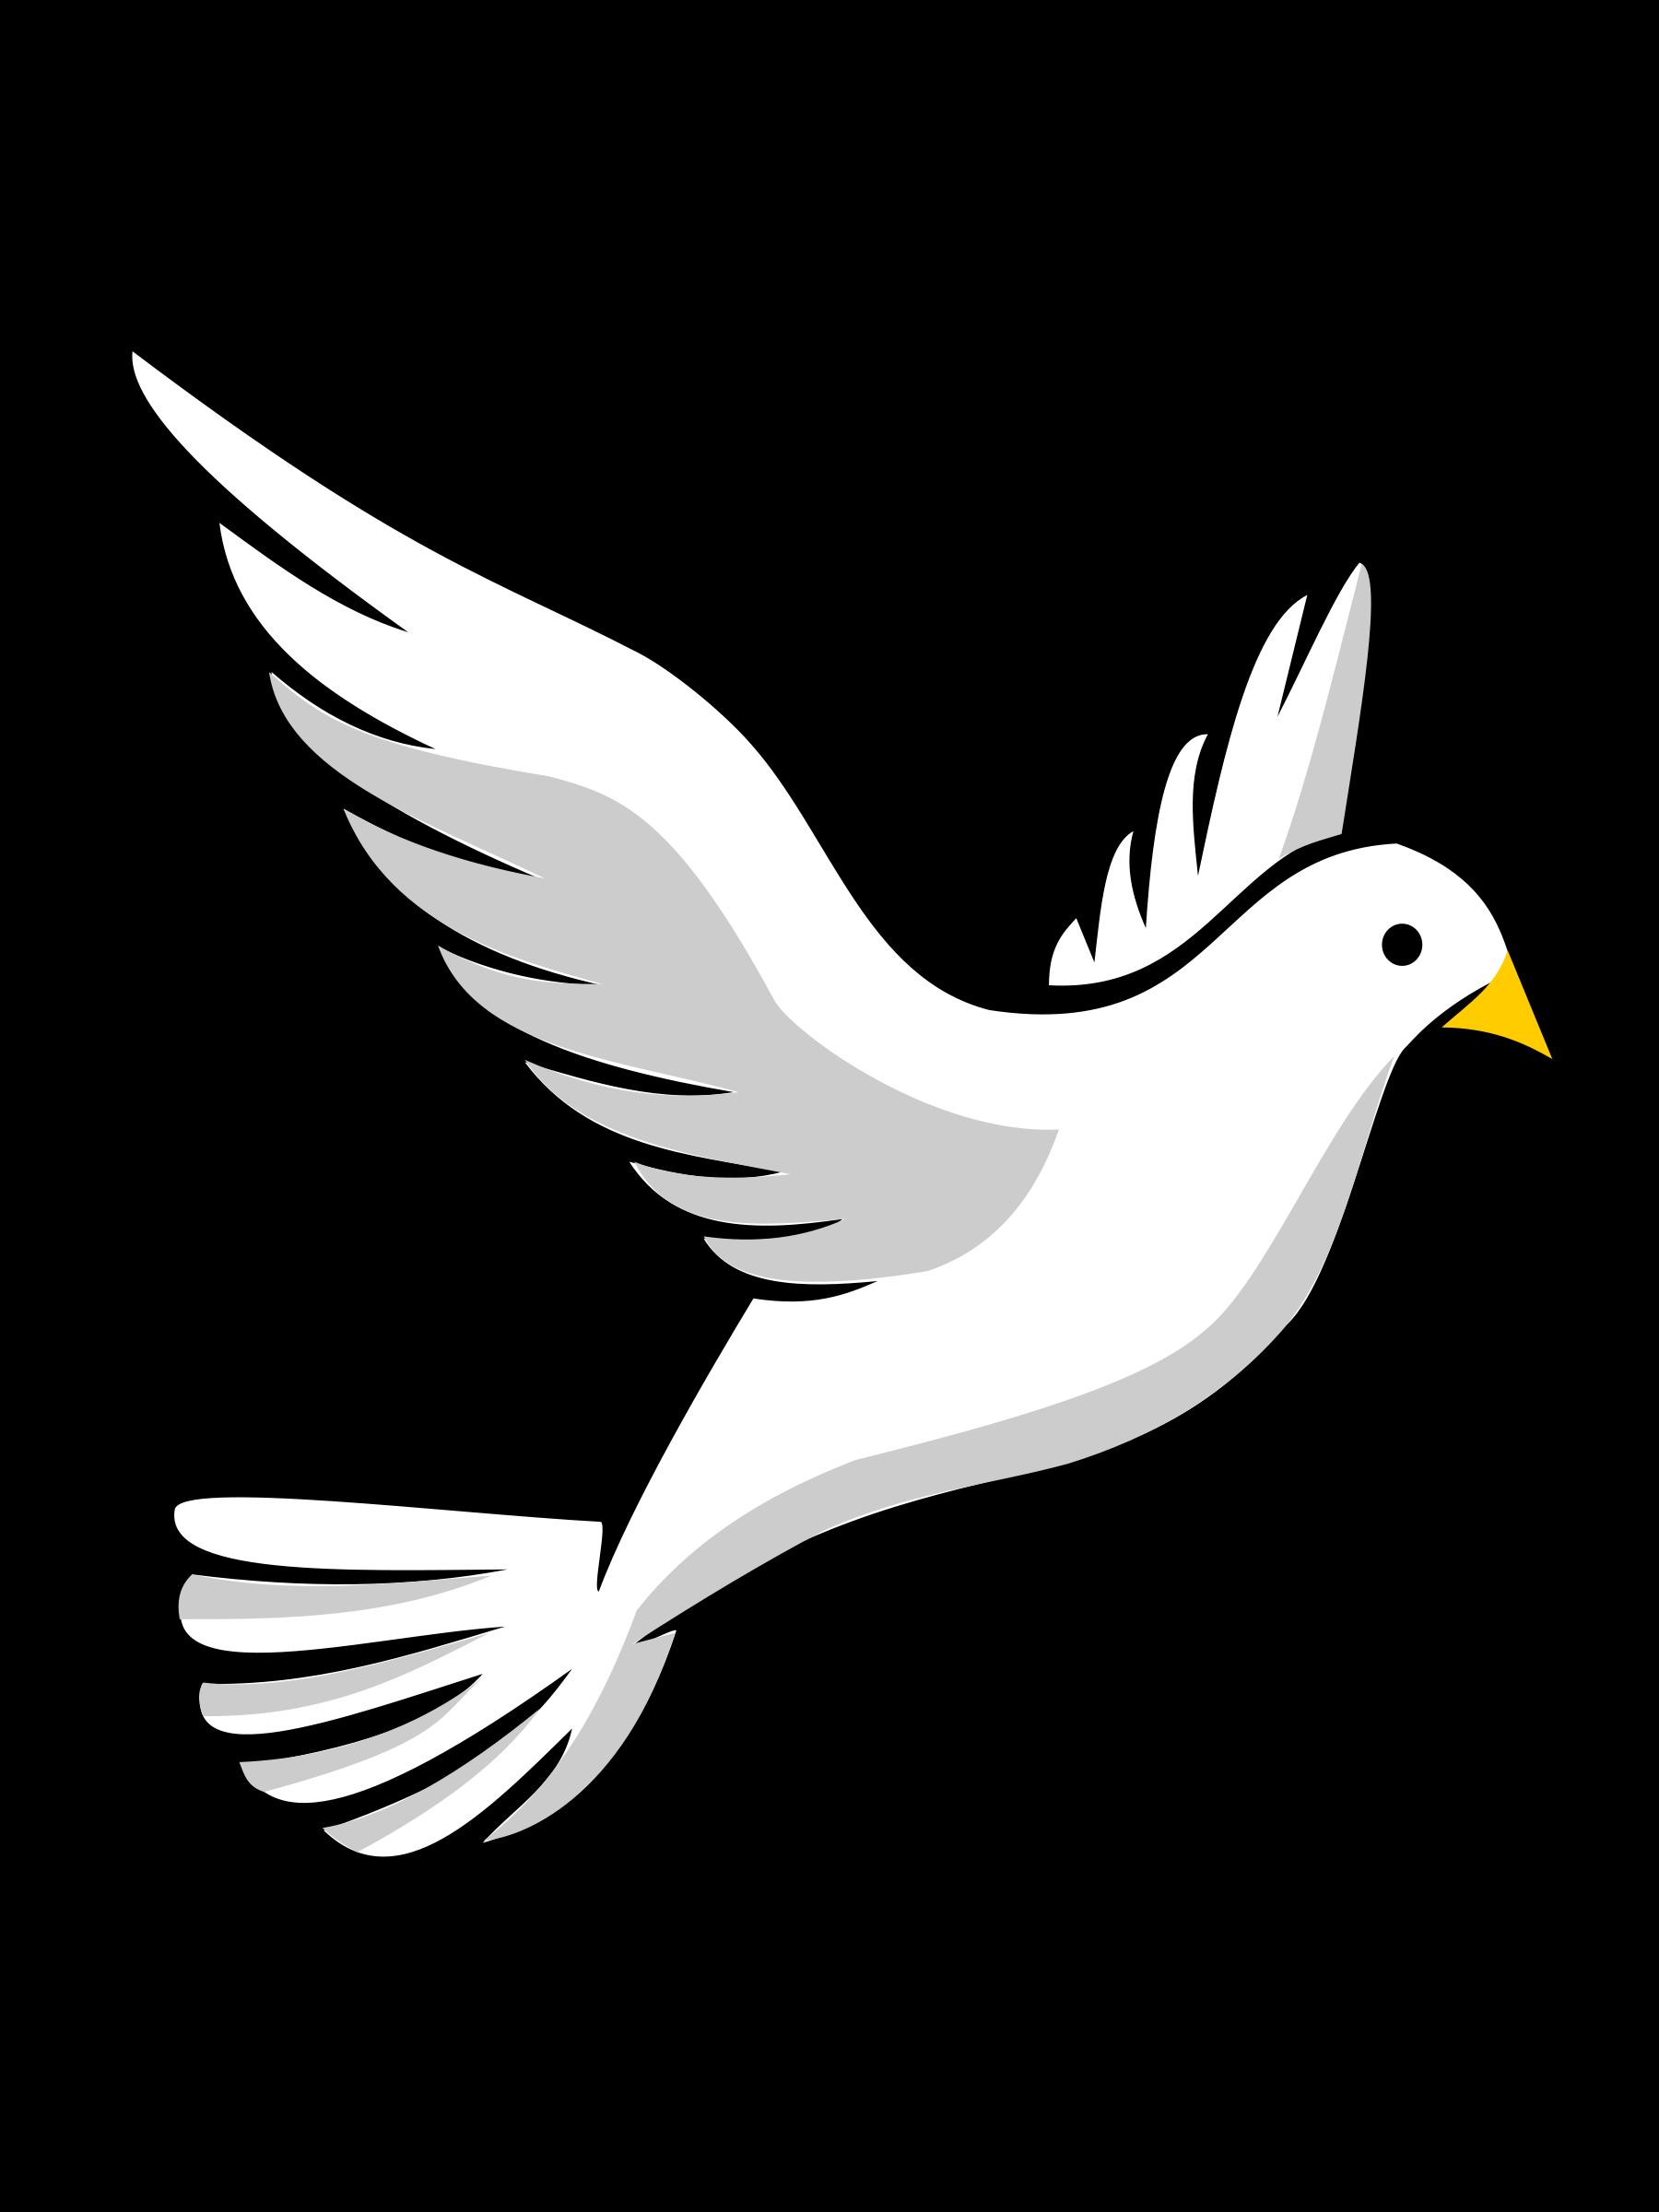 clipart free Religious dove clip art. Doves clipart cute.